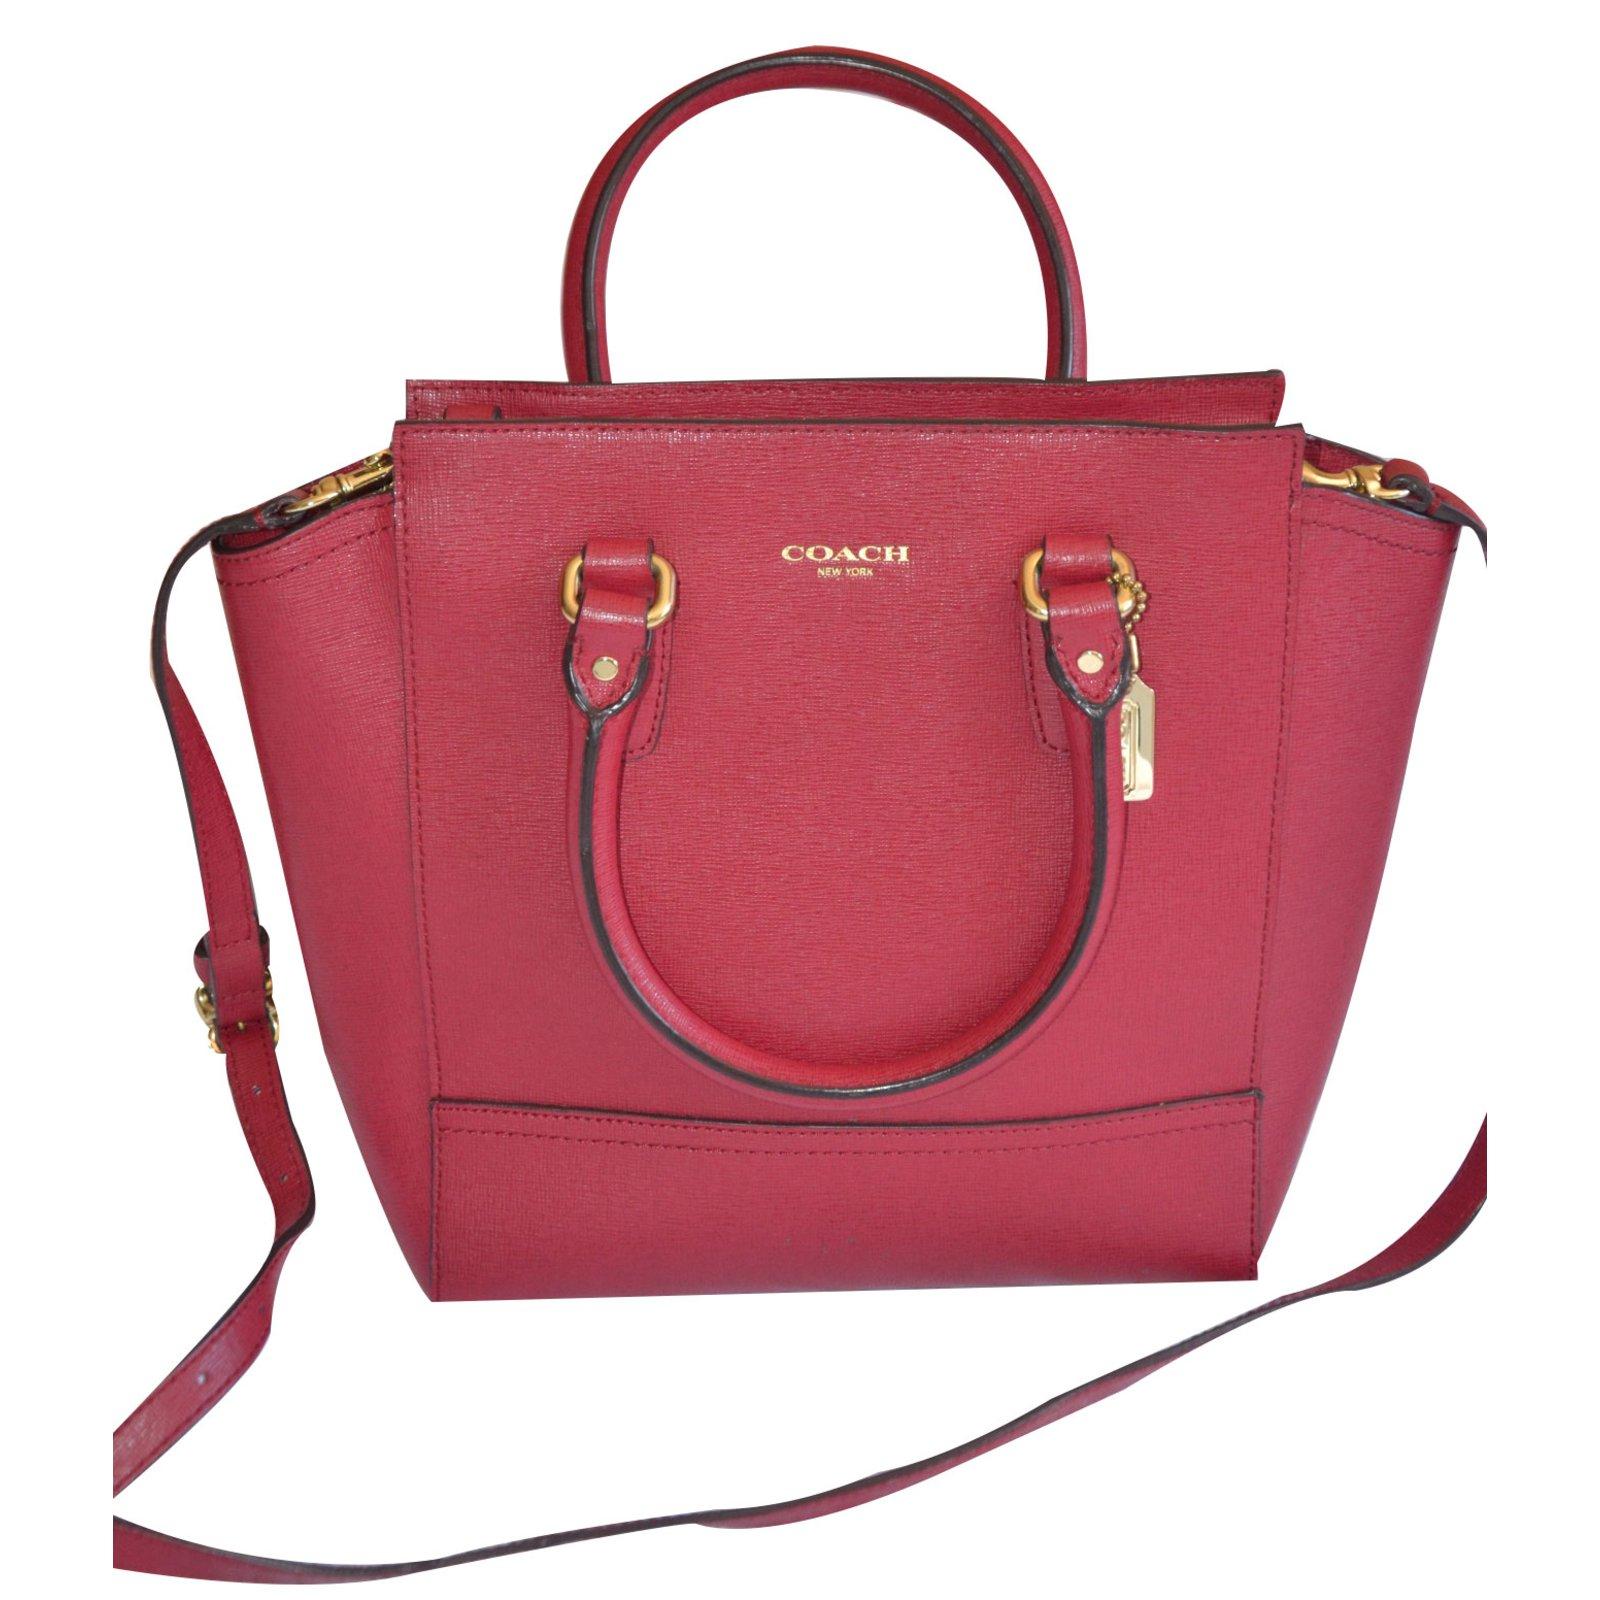 746fa90b0 Coach Handbags Handbags Leather Red ref.18644 - Joli Closet